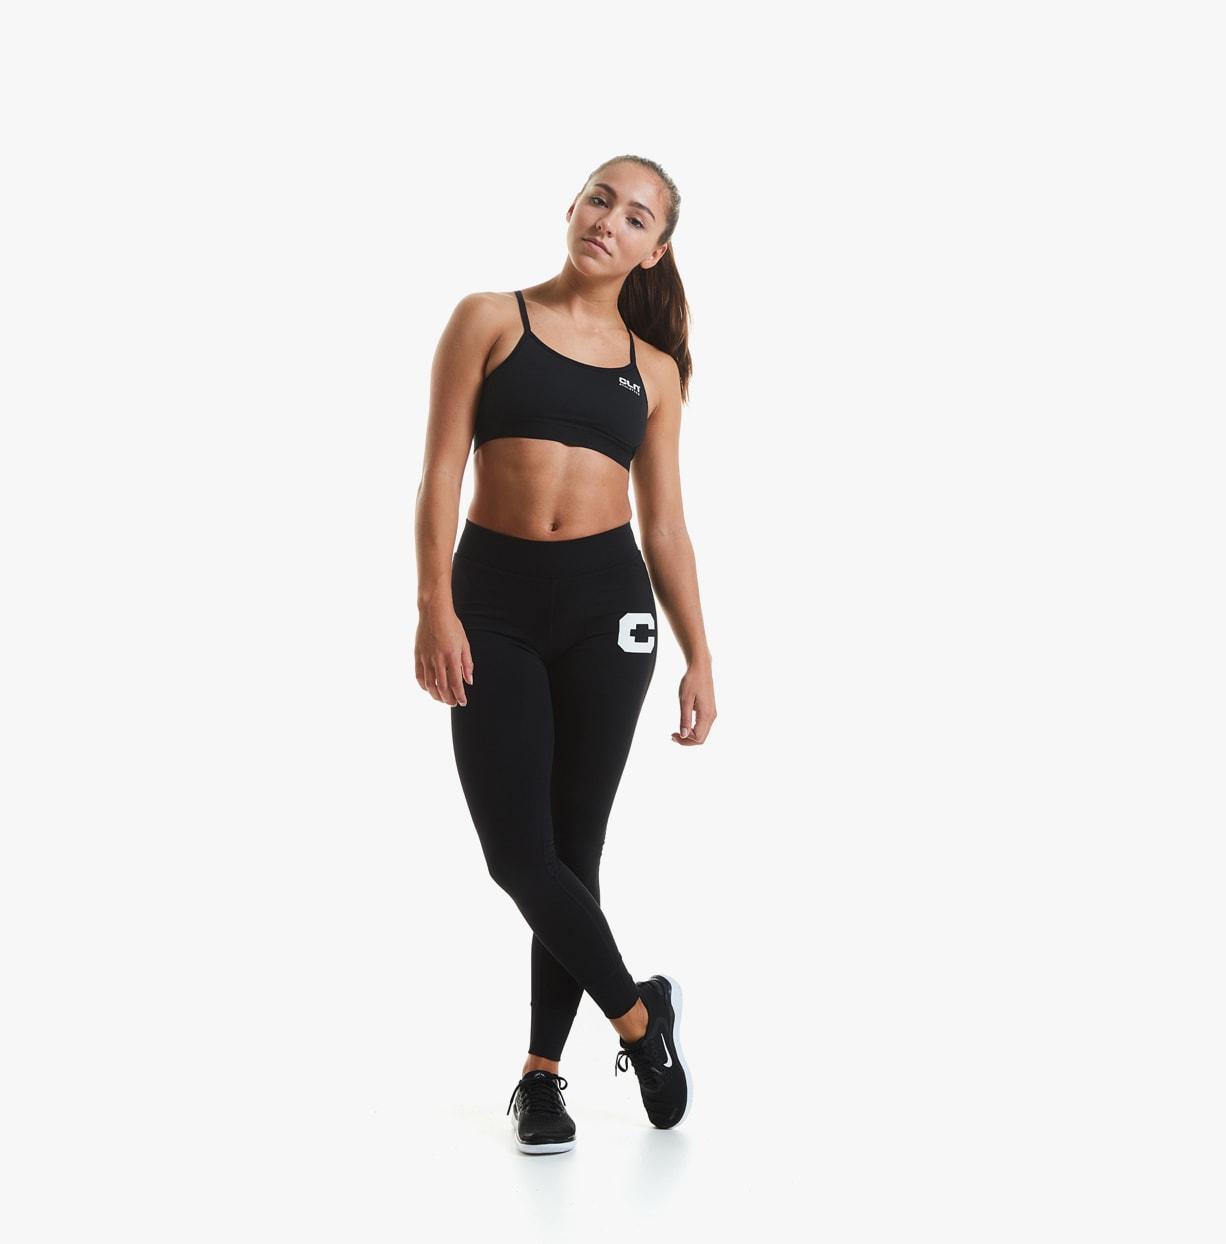 cln-liza-sports-bra-black-2